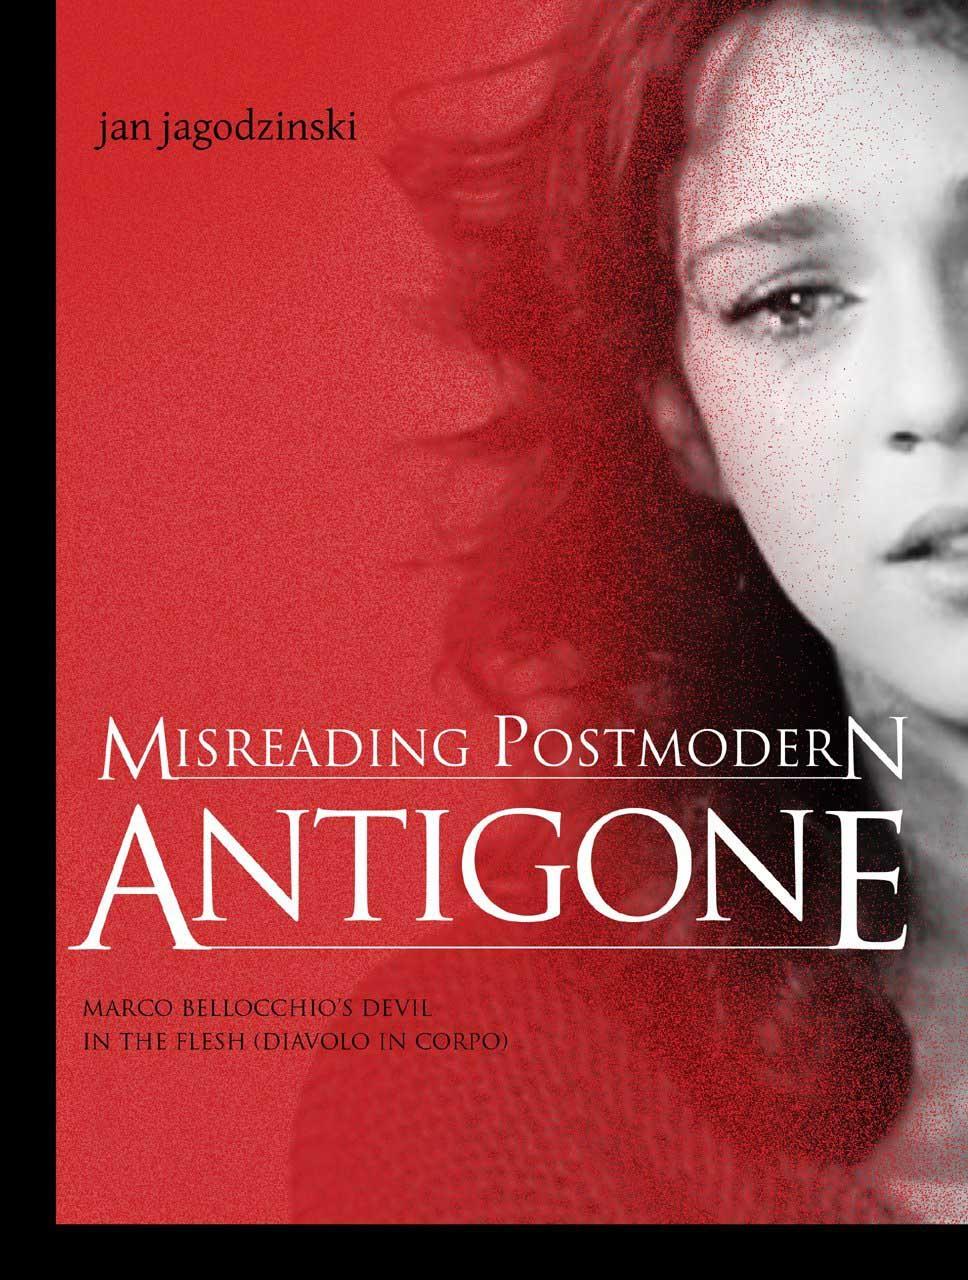 Misreading Postmodern Antigone – Marco Bellocchio?s Devil in the Flesh (Diavolo in Corpo)